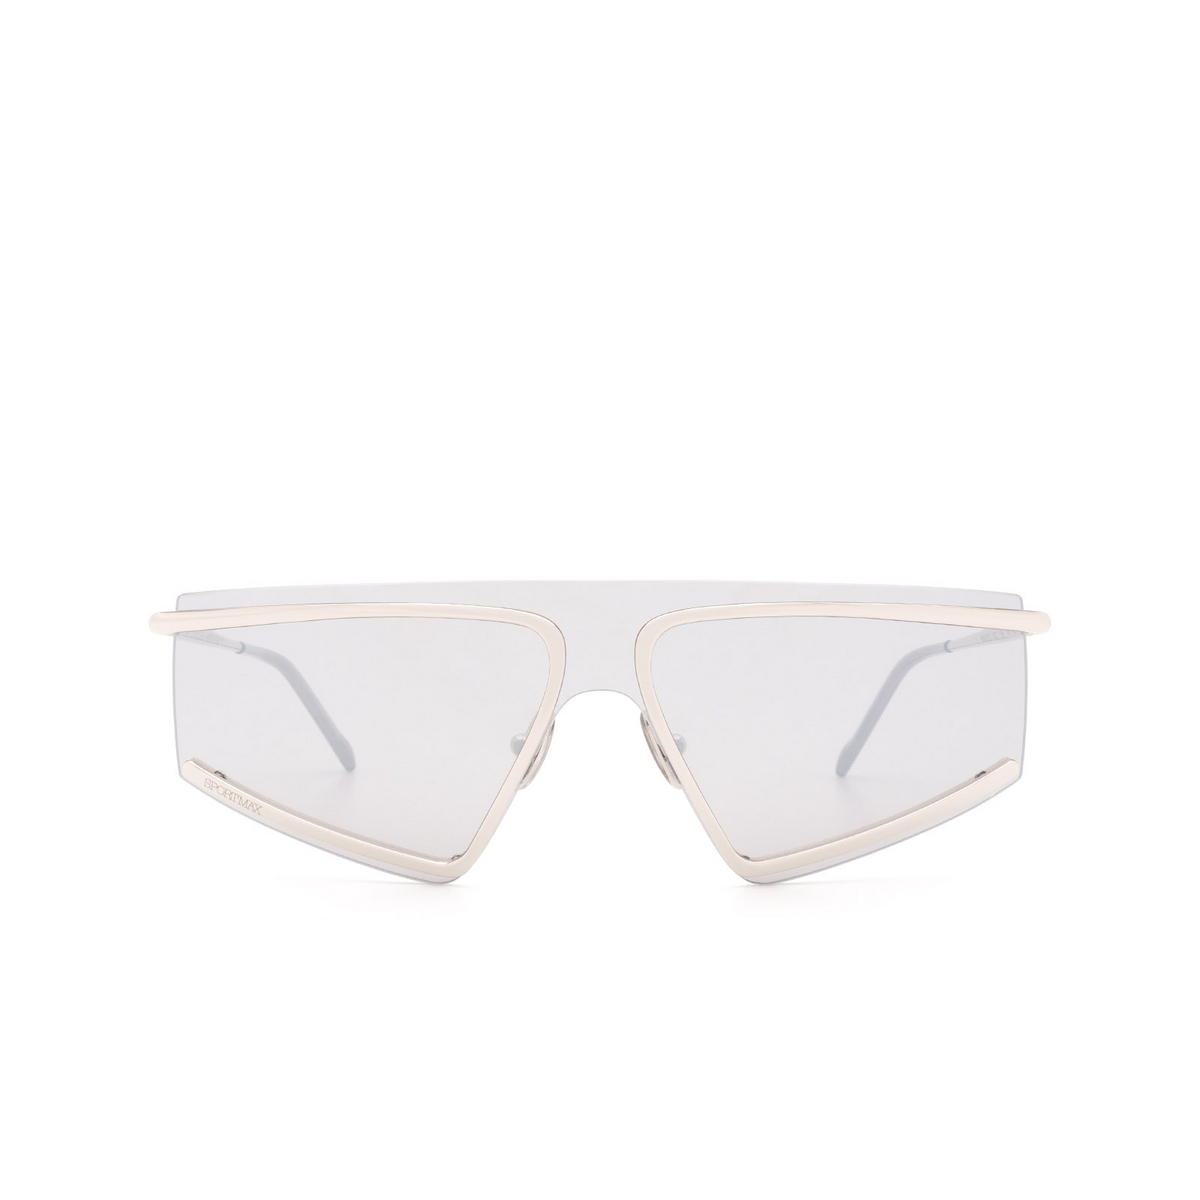 Sportmax® Mask Sunglasses: SM0023 color Shiny Palladium 16C - front view.